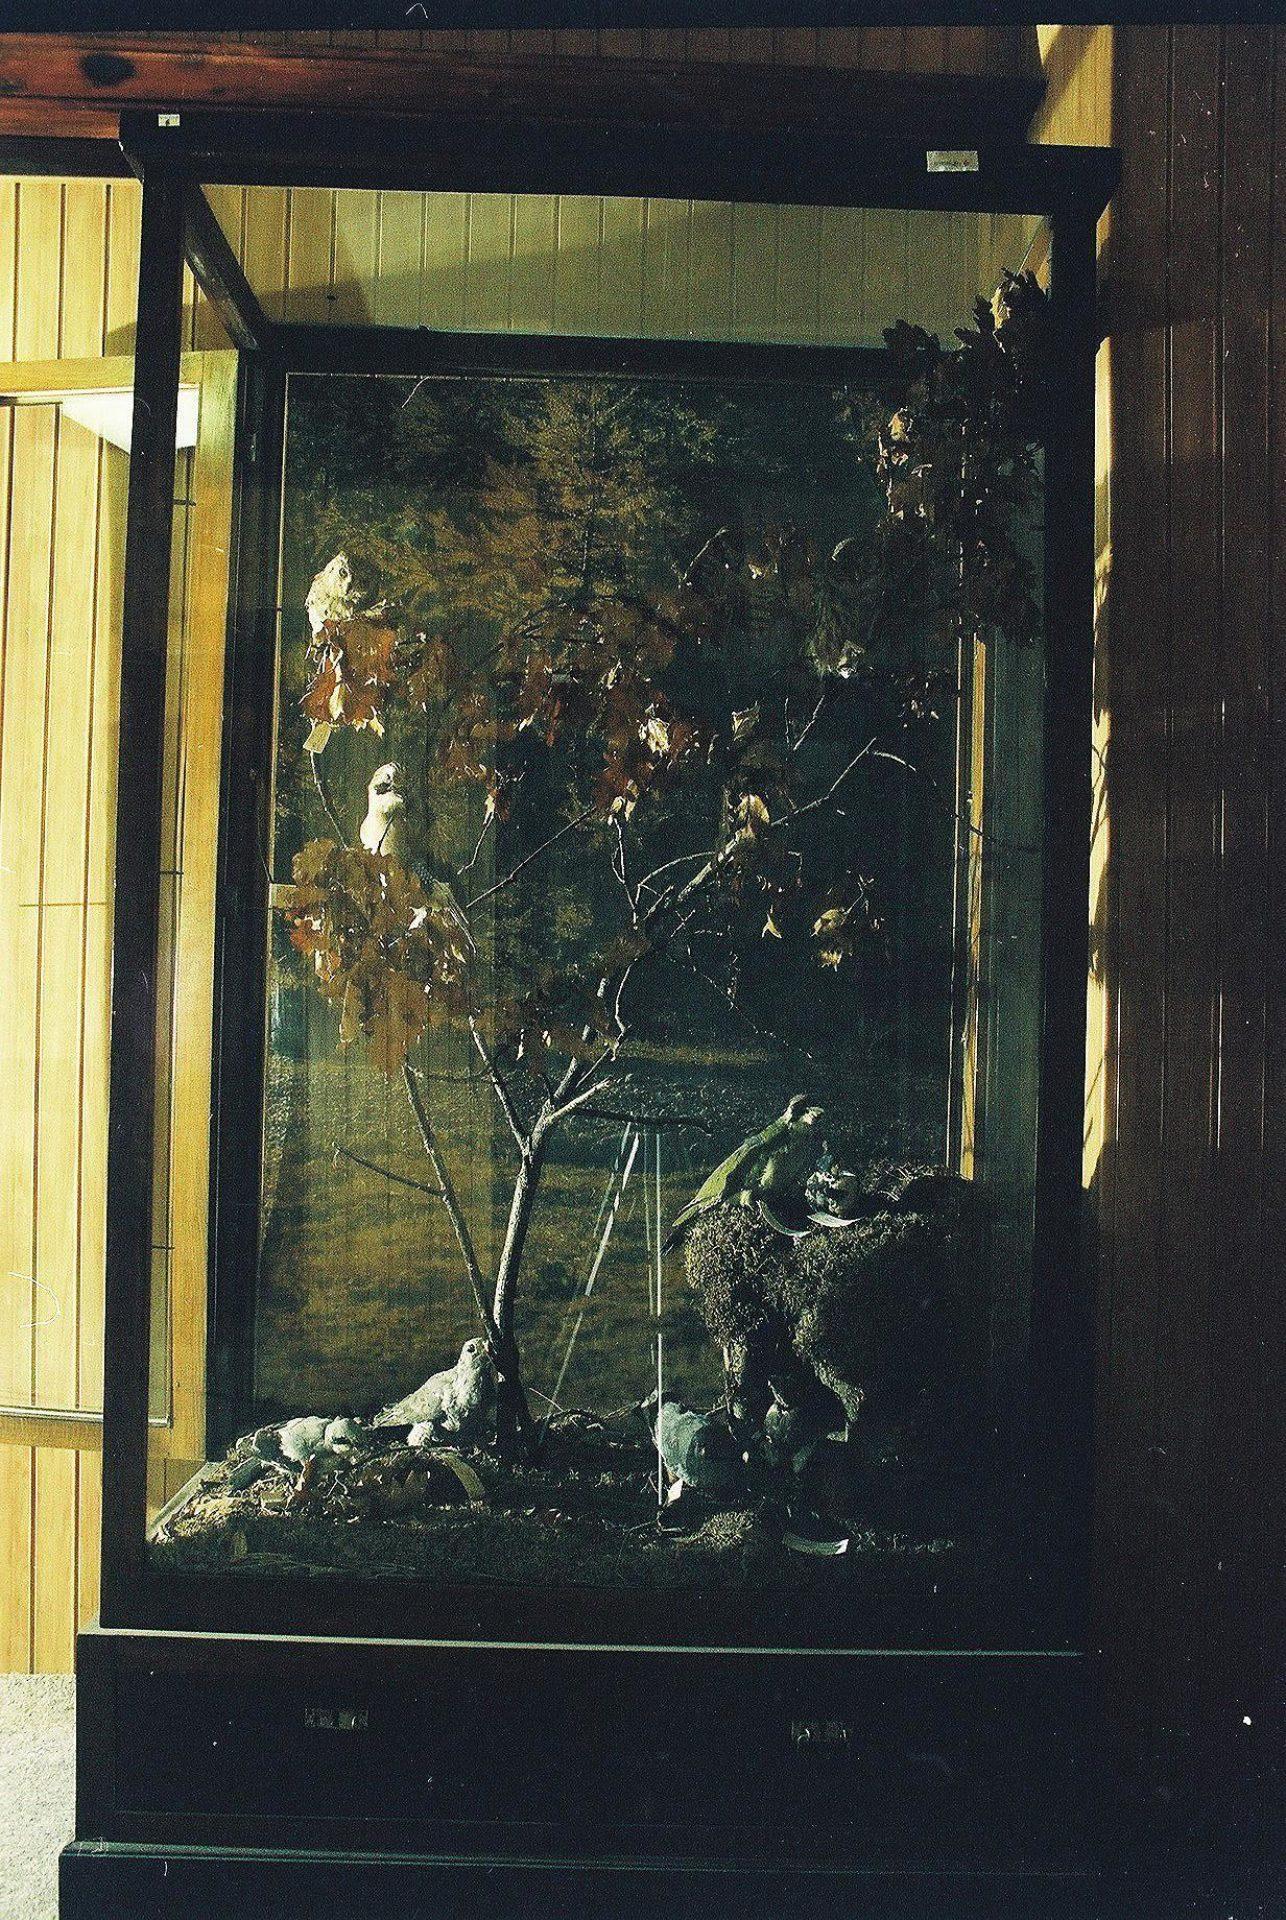 Petrit Halilaj, Special Edition (ex-Natural History Museum of Kosovo), 2013 (70/80)